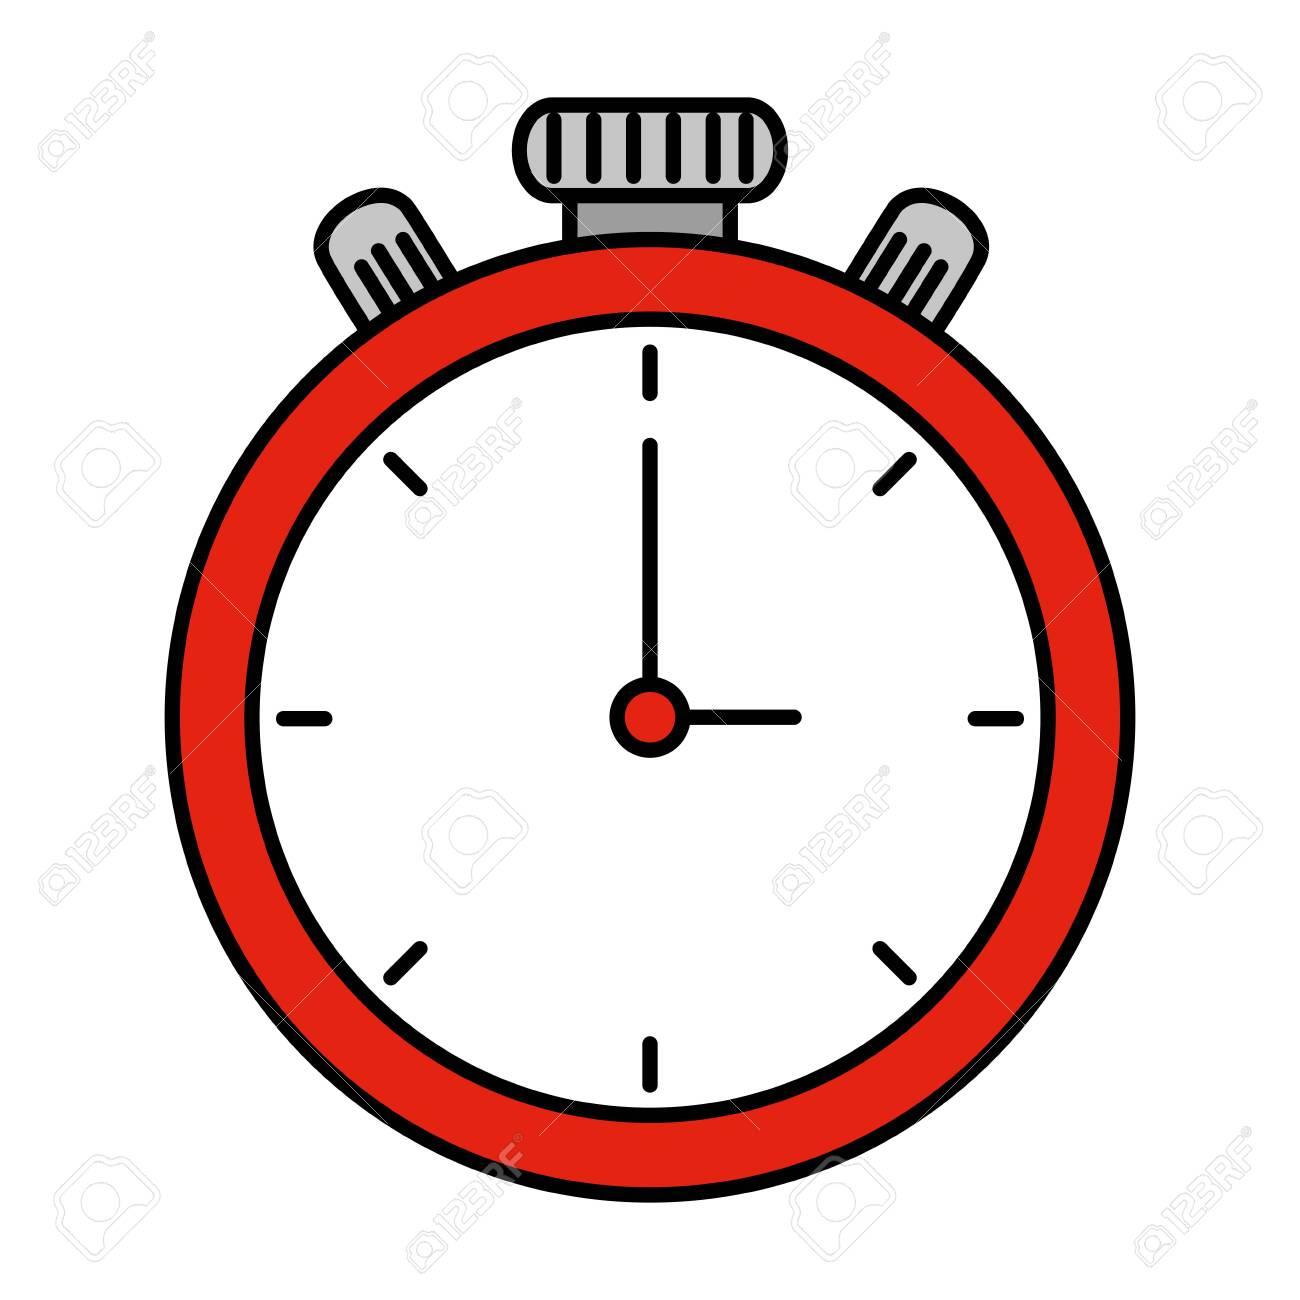 chronometer timer isolated icon vector illustration design - 129483613